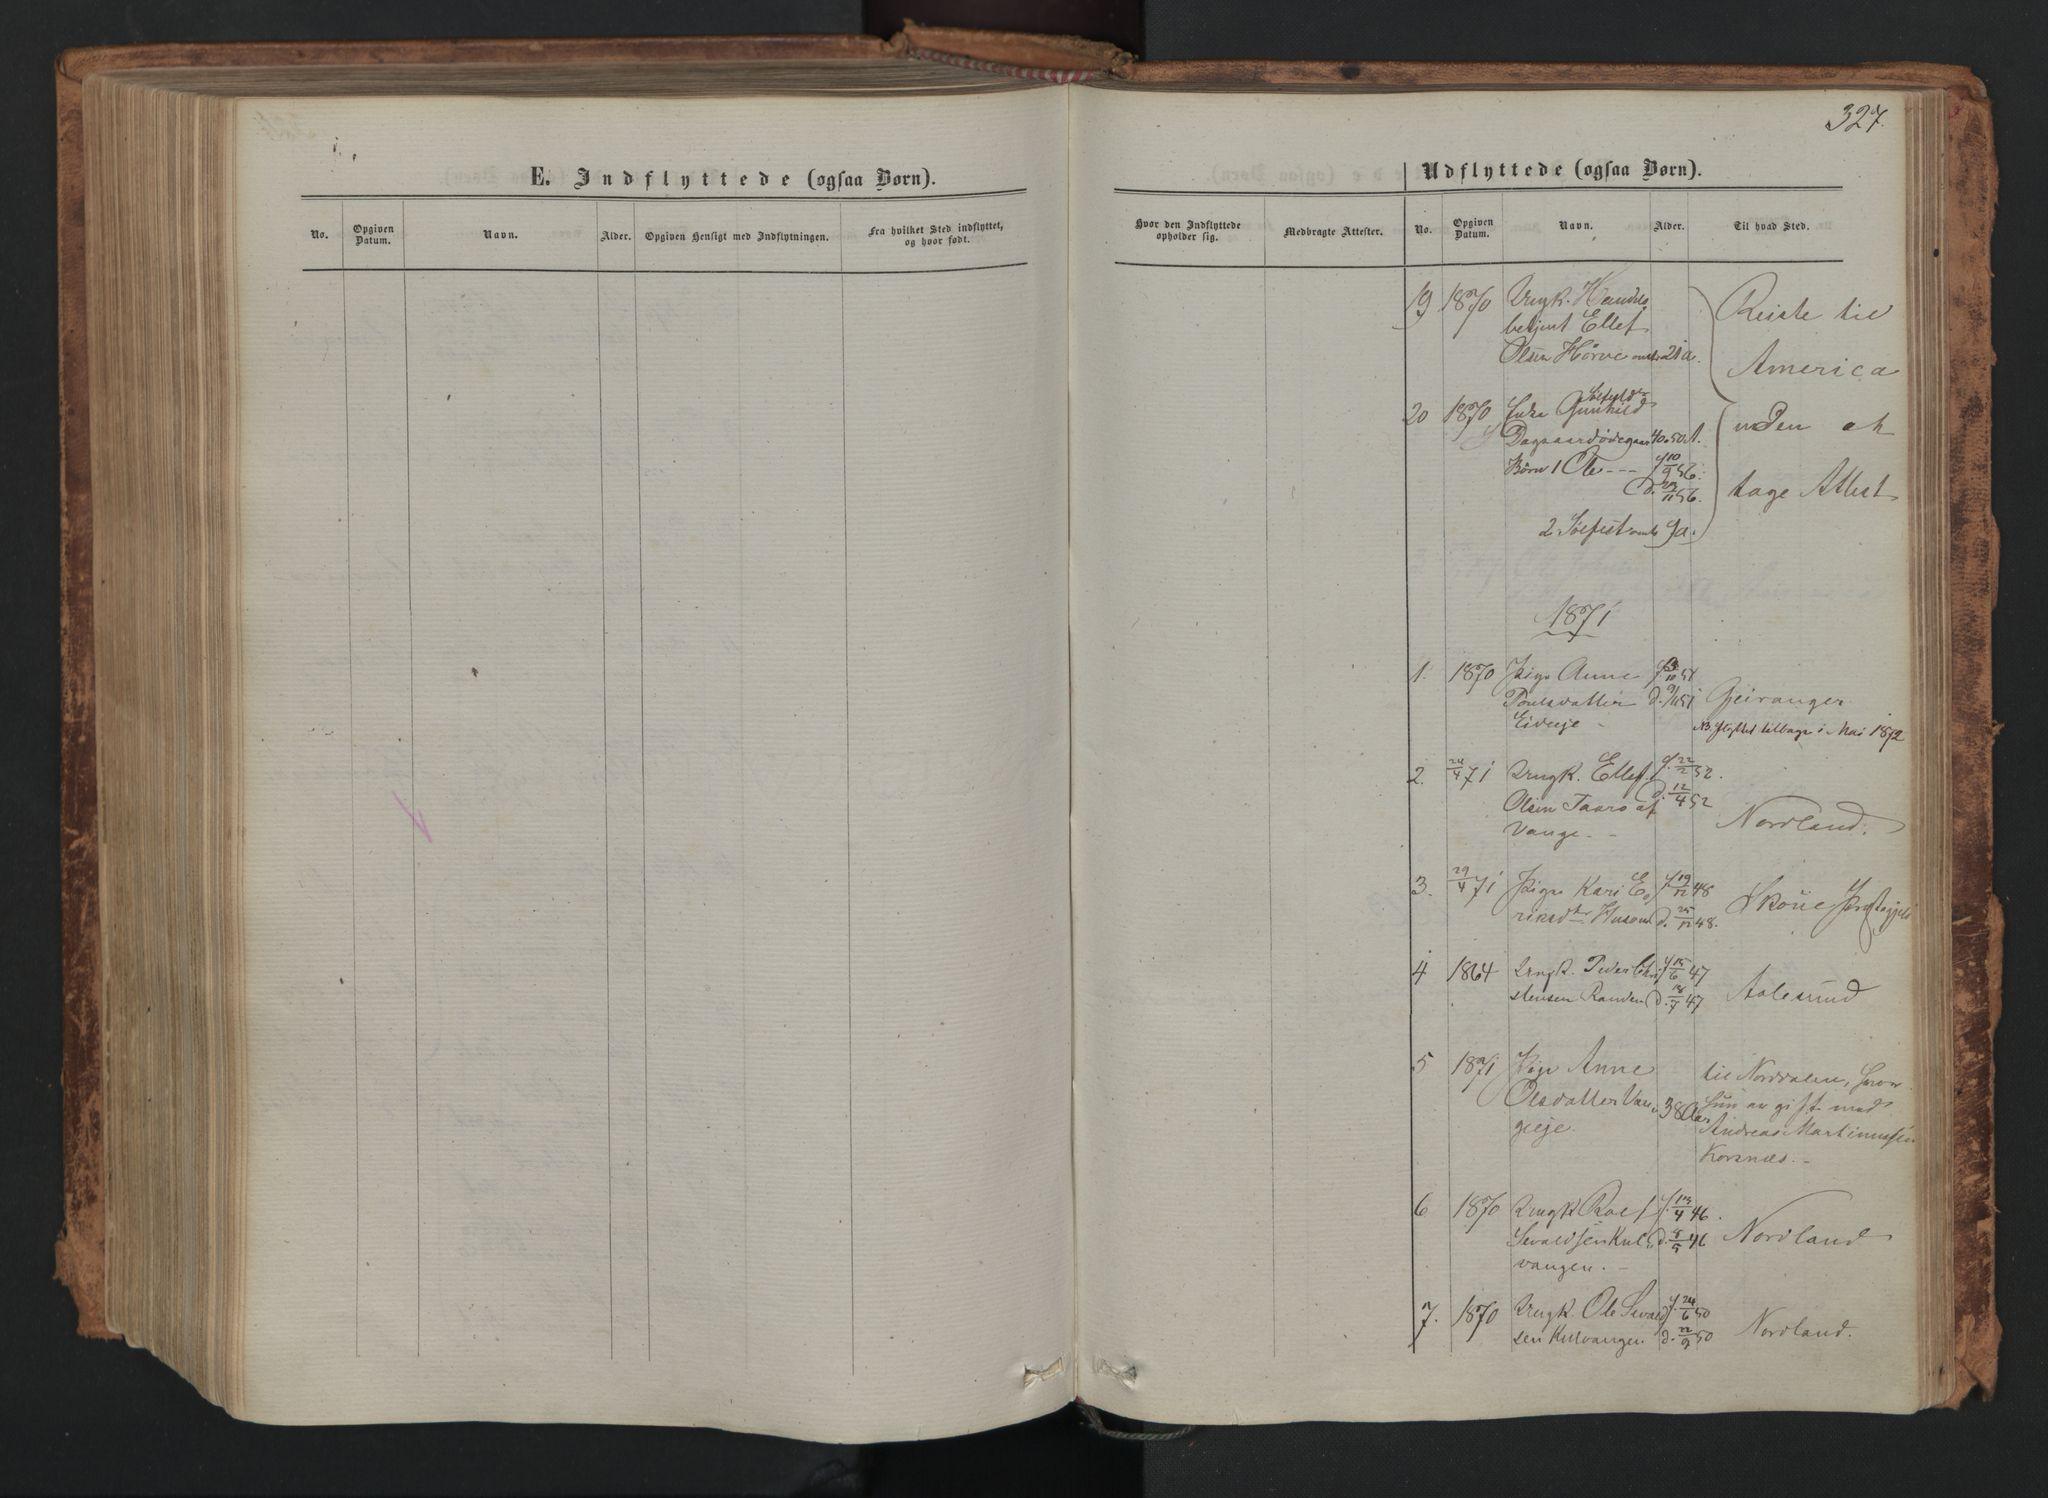 SAH, Skjåk prestekontor, Ministerialbok nr. 1, 1863-1879, s. 327